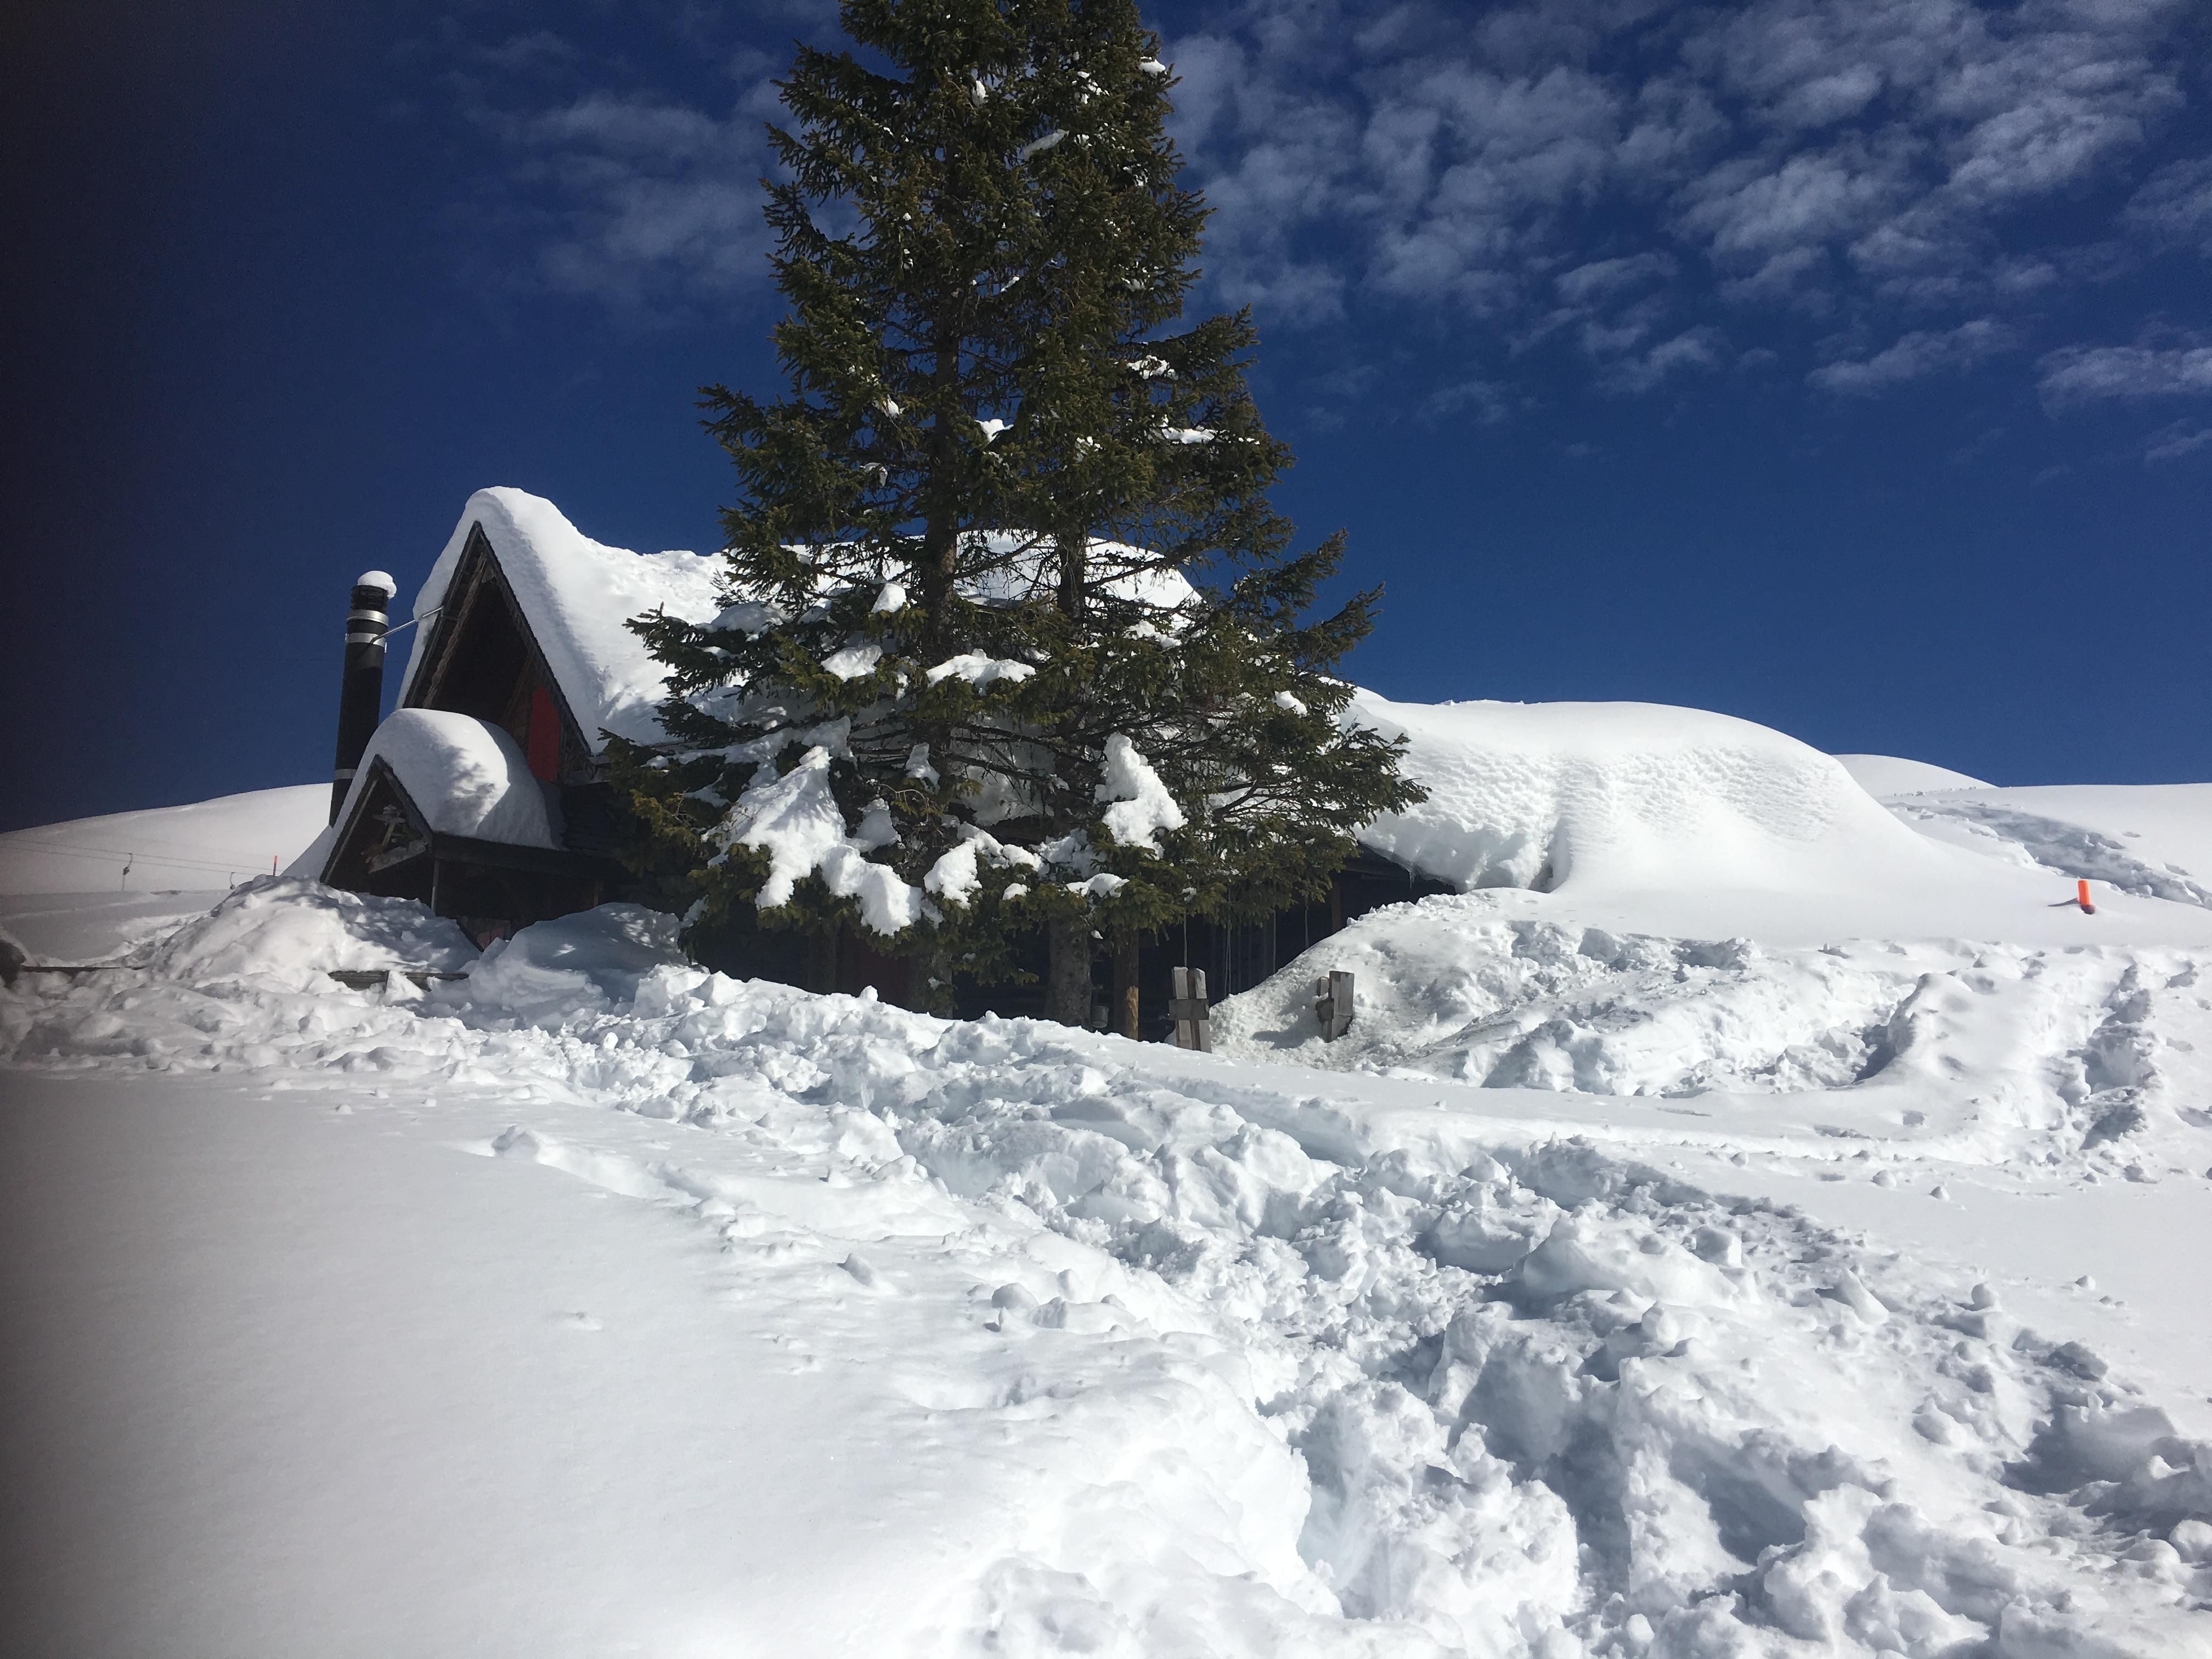 Lagerhaus Chrüzhütte Winter